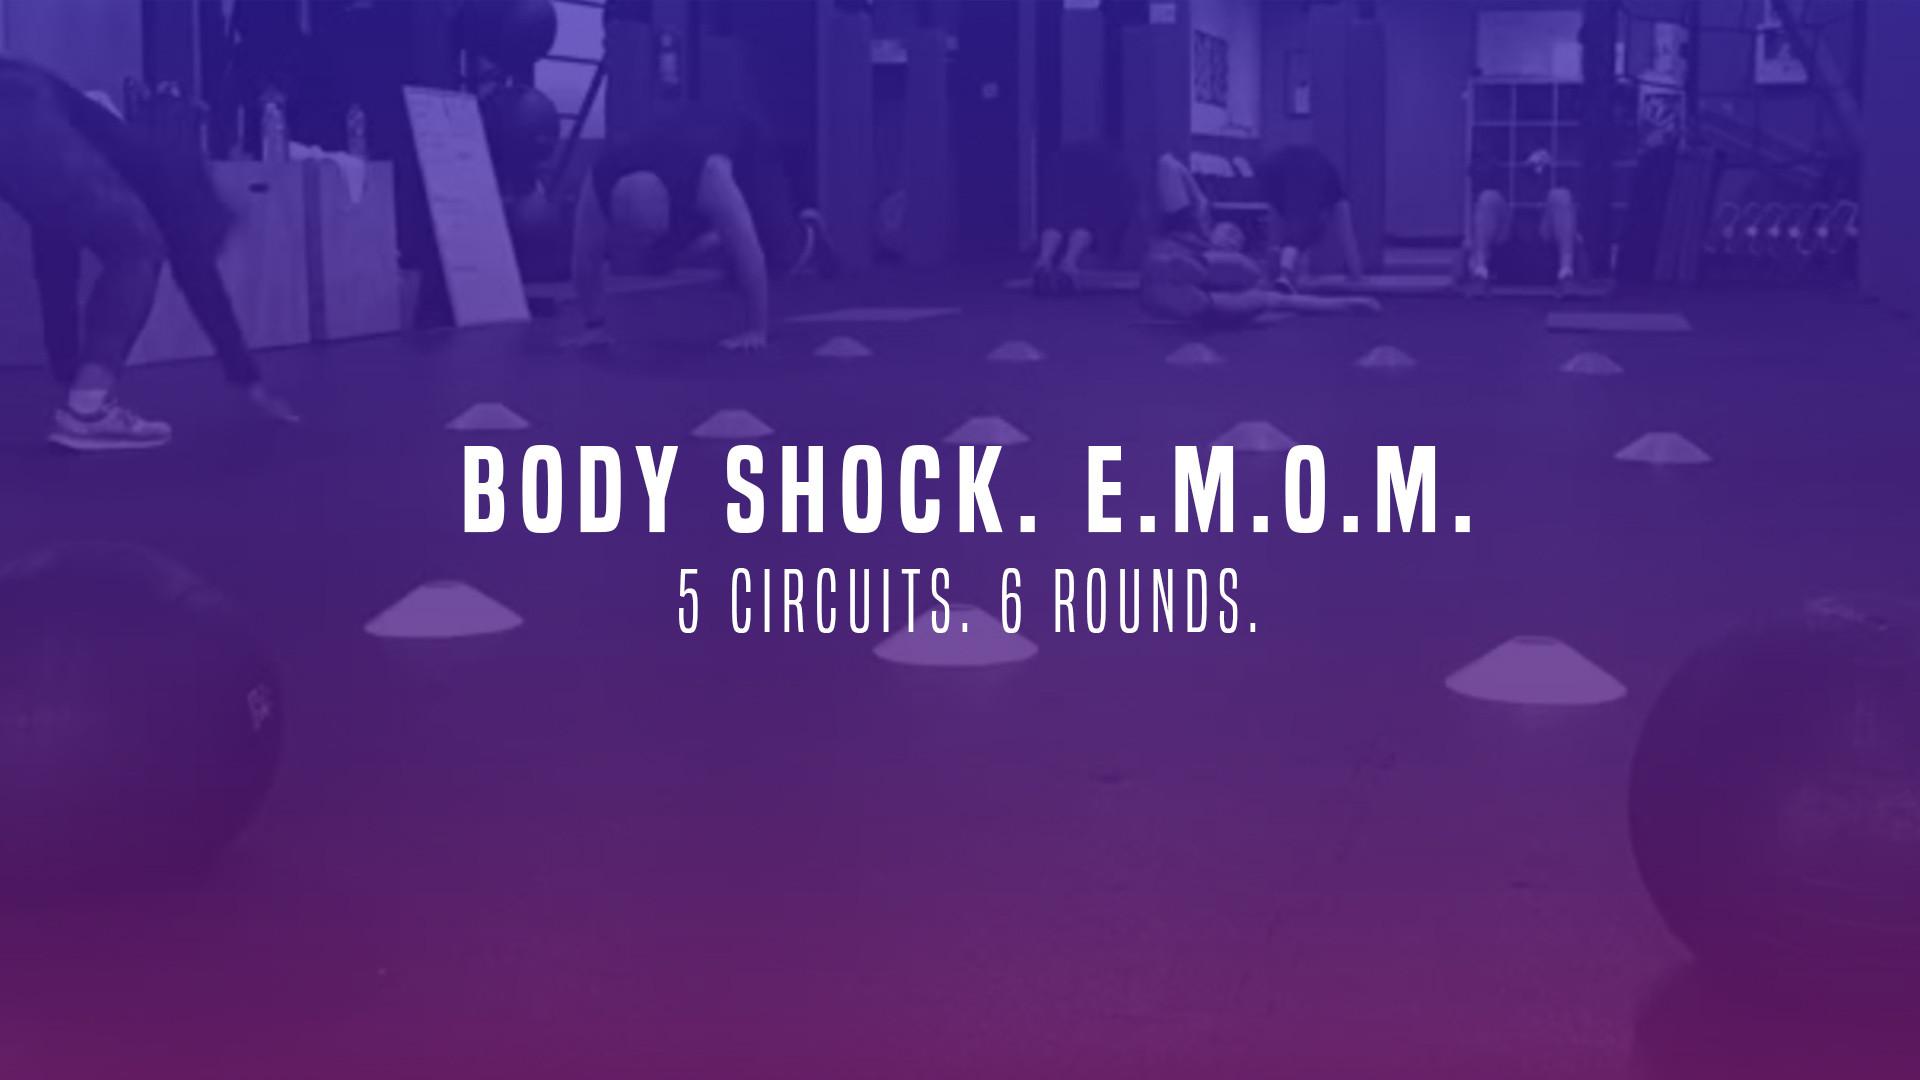 WOD 13: Body Shock. E.M.O.M. 5 Circuits. 6 Rounds.